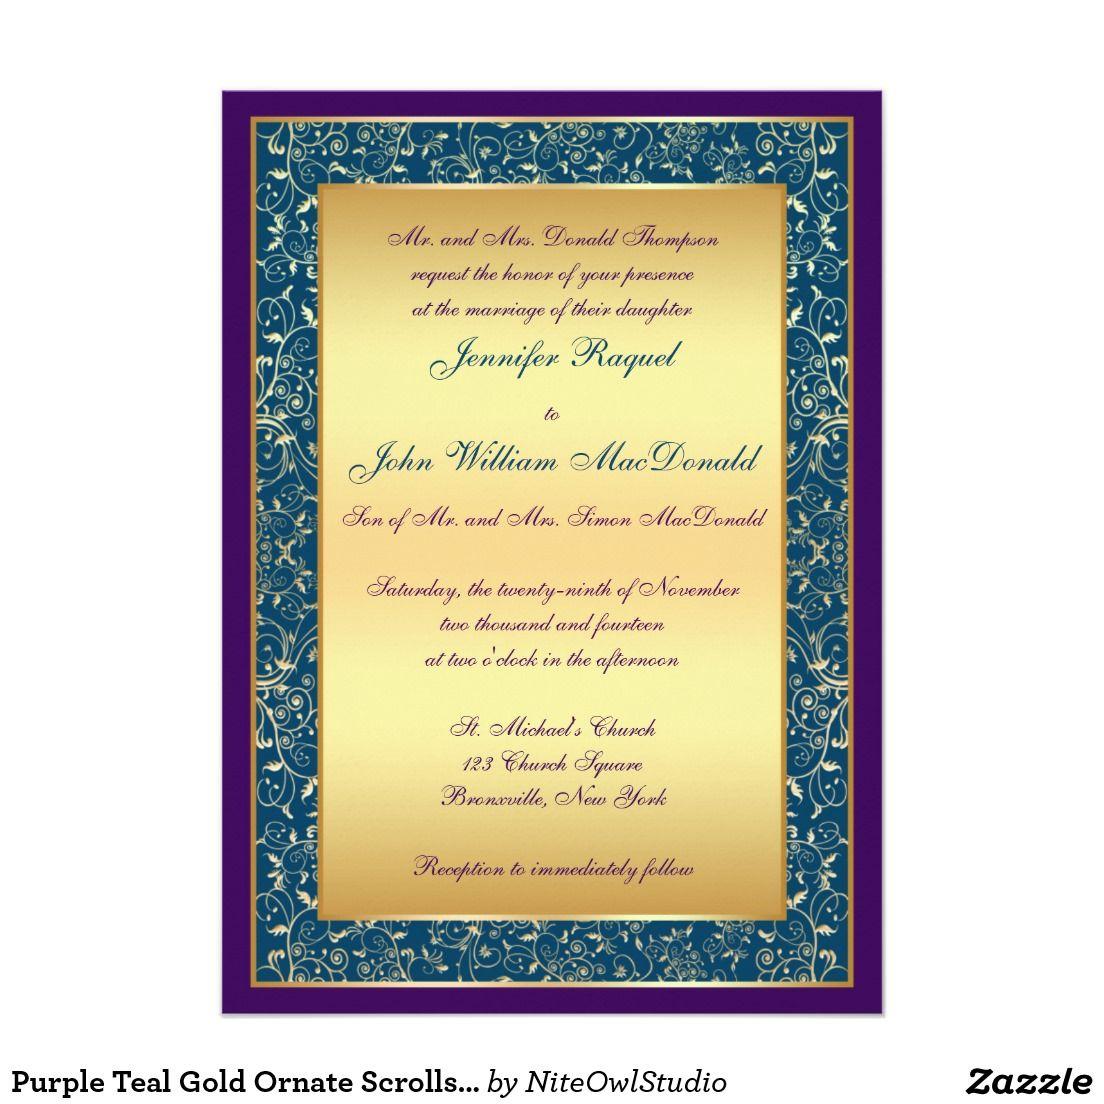 Wedding invitations wedding invitation purple gold ornate - Purple Teal Gold Ornate Scrolls Wedding Invite